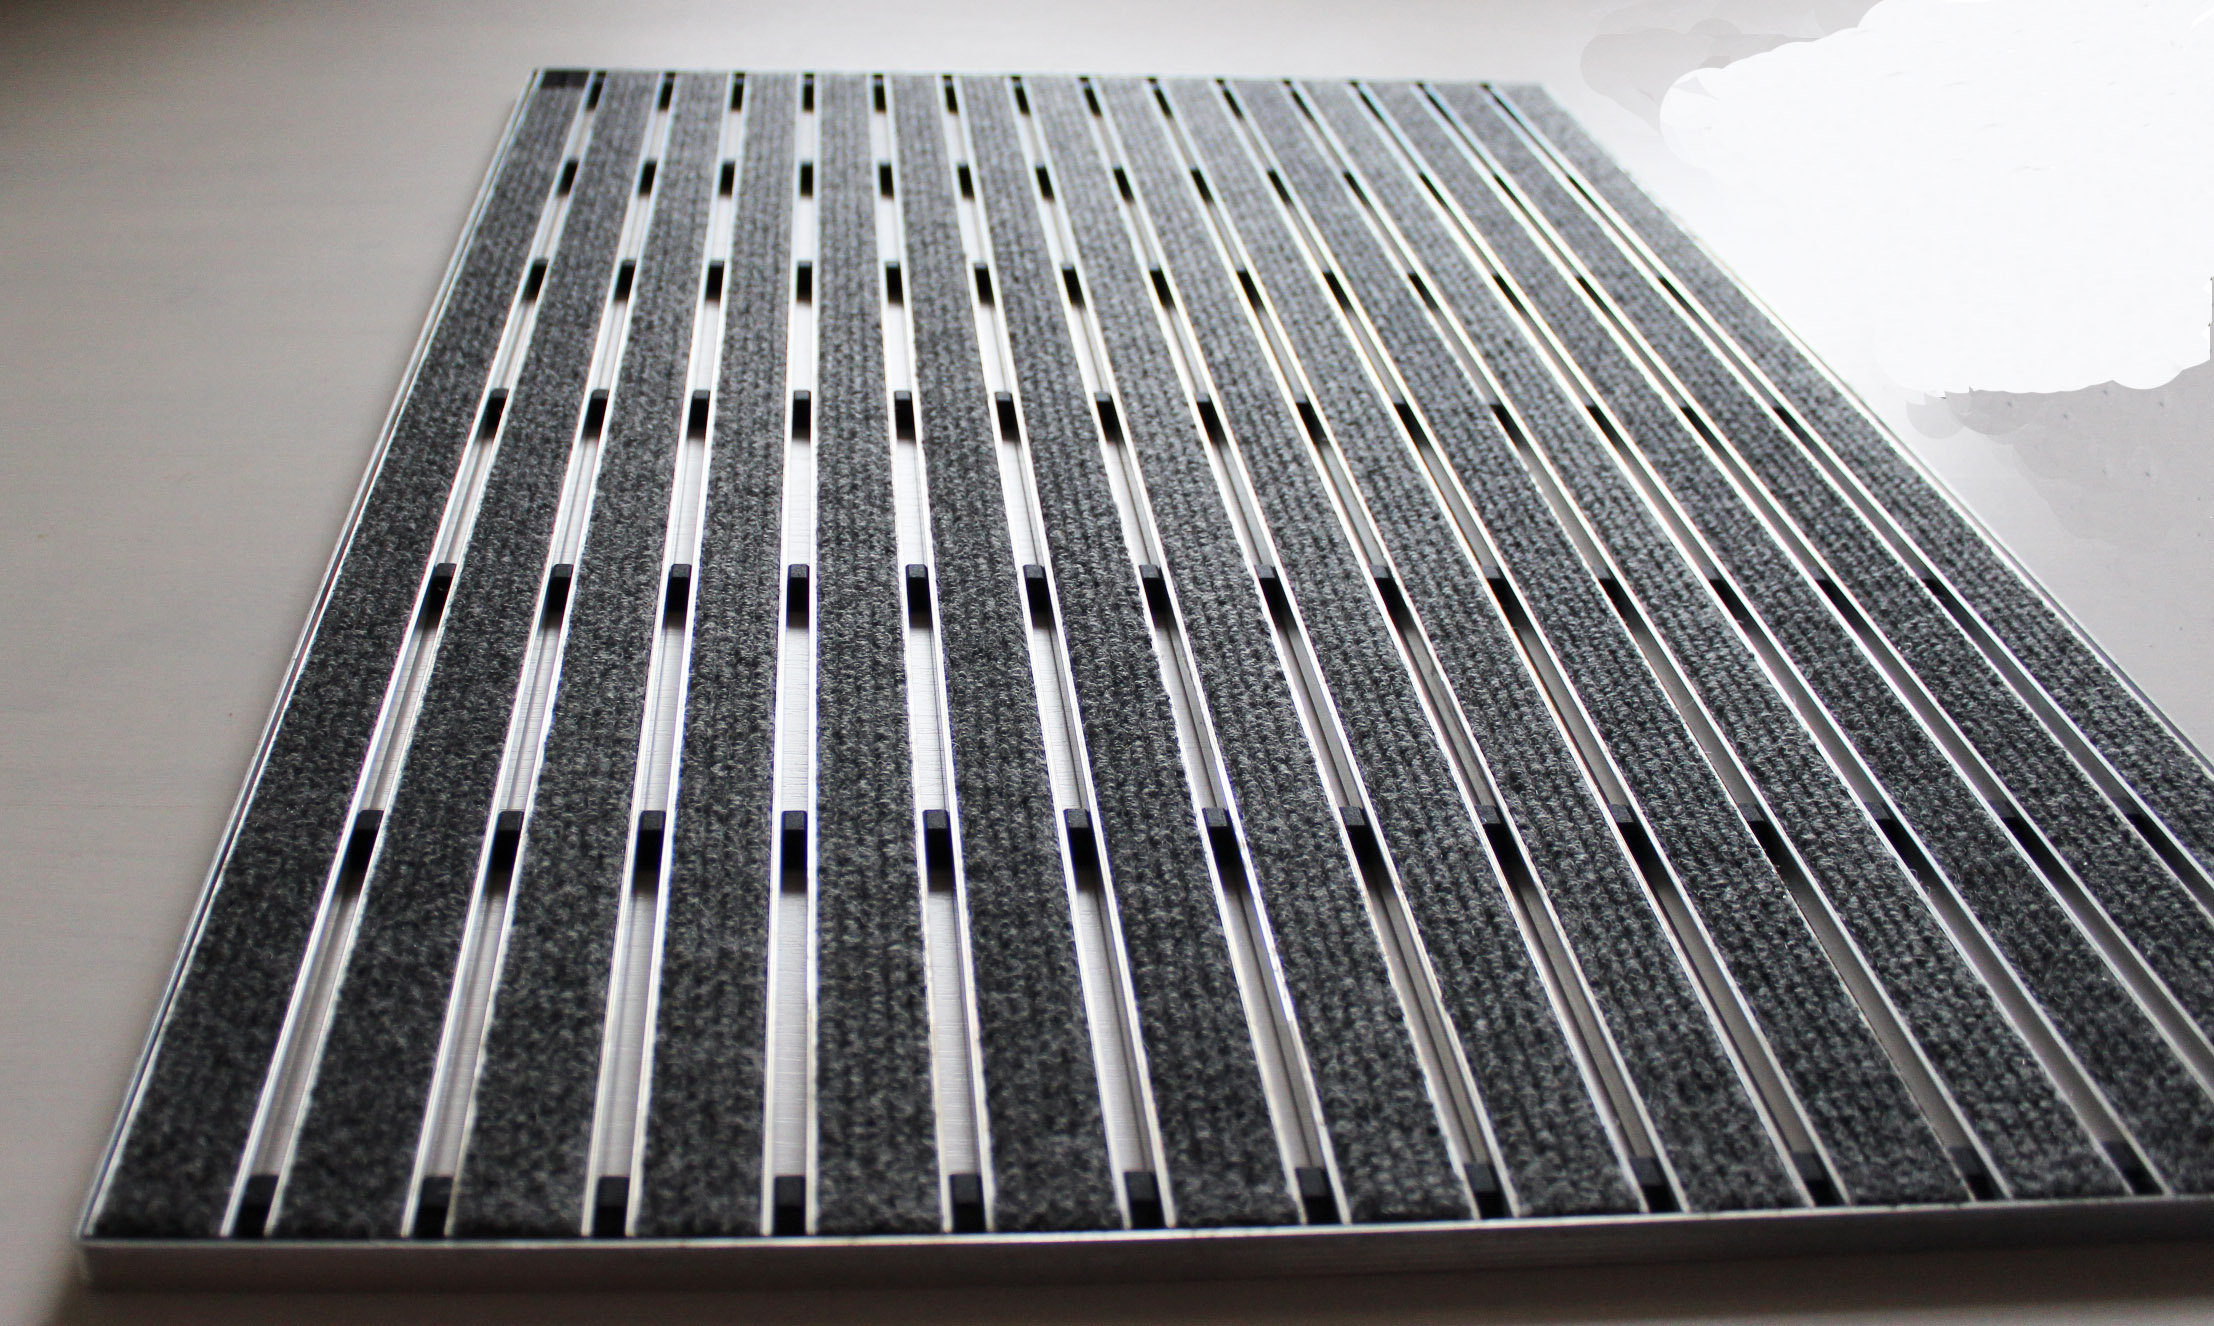 aco self indoor schuhabstreifer matte 75 x 50 grau abtreter fu matte 37256 75x50 ebay. Black Bedroom Furniture Sets. Home Design Ideas